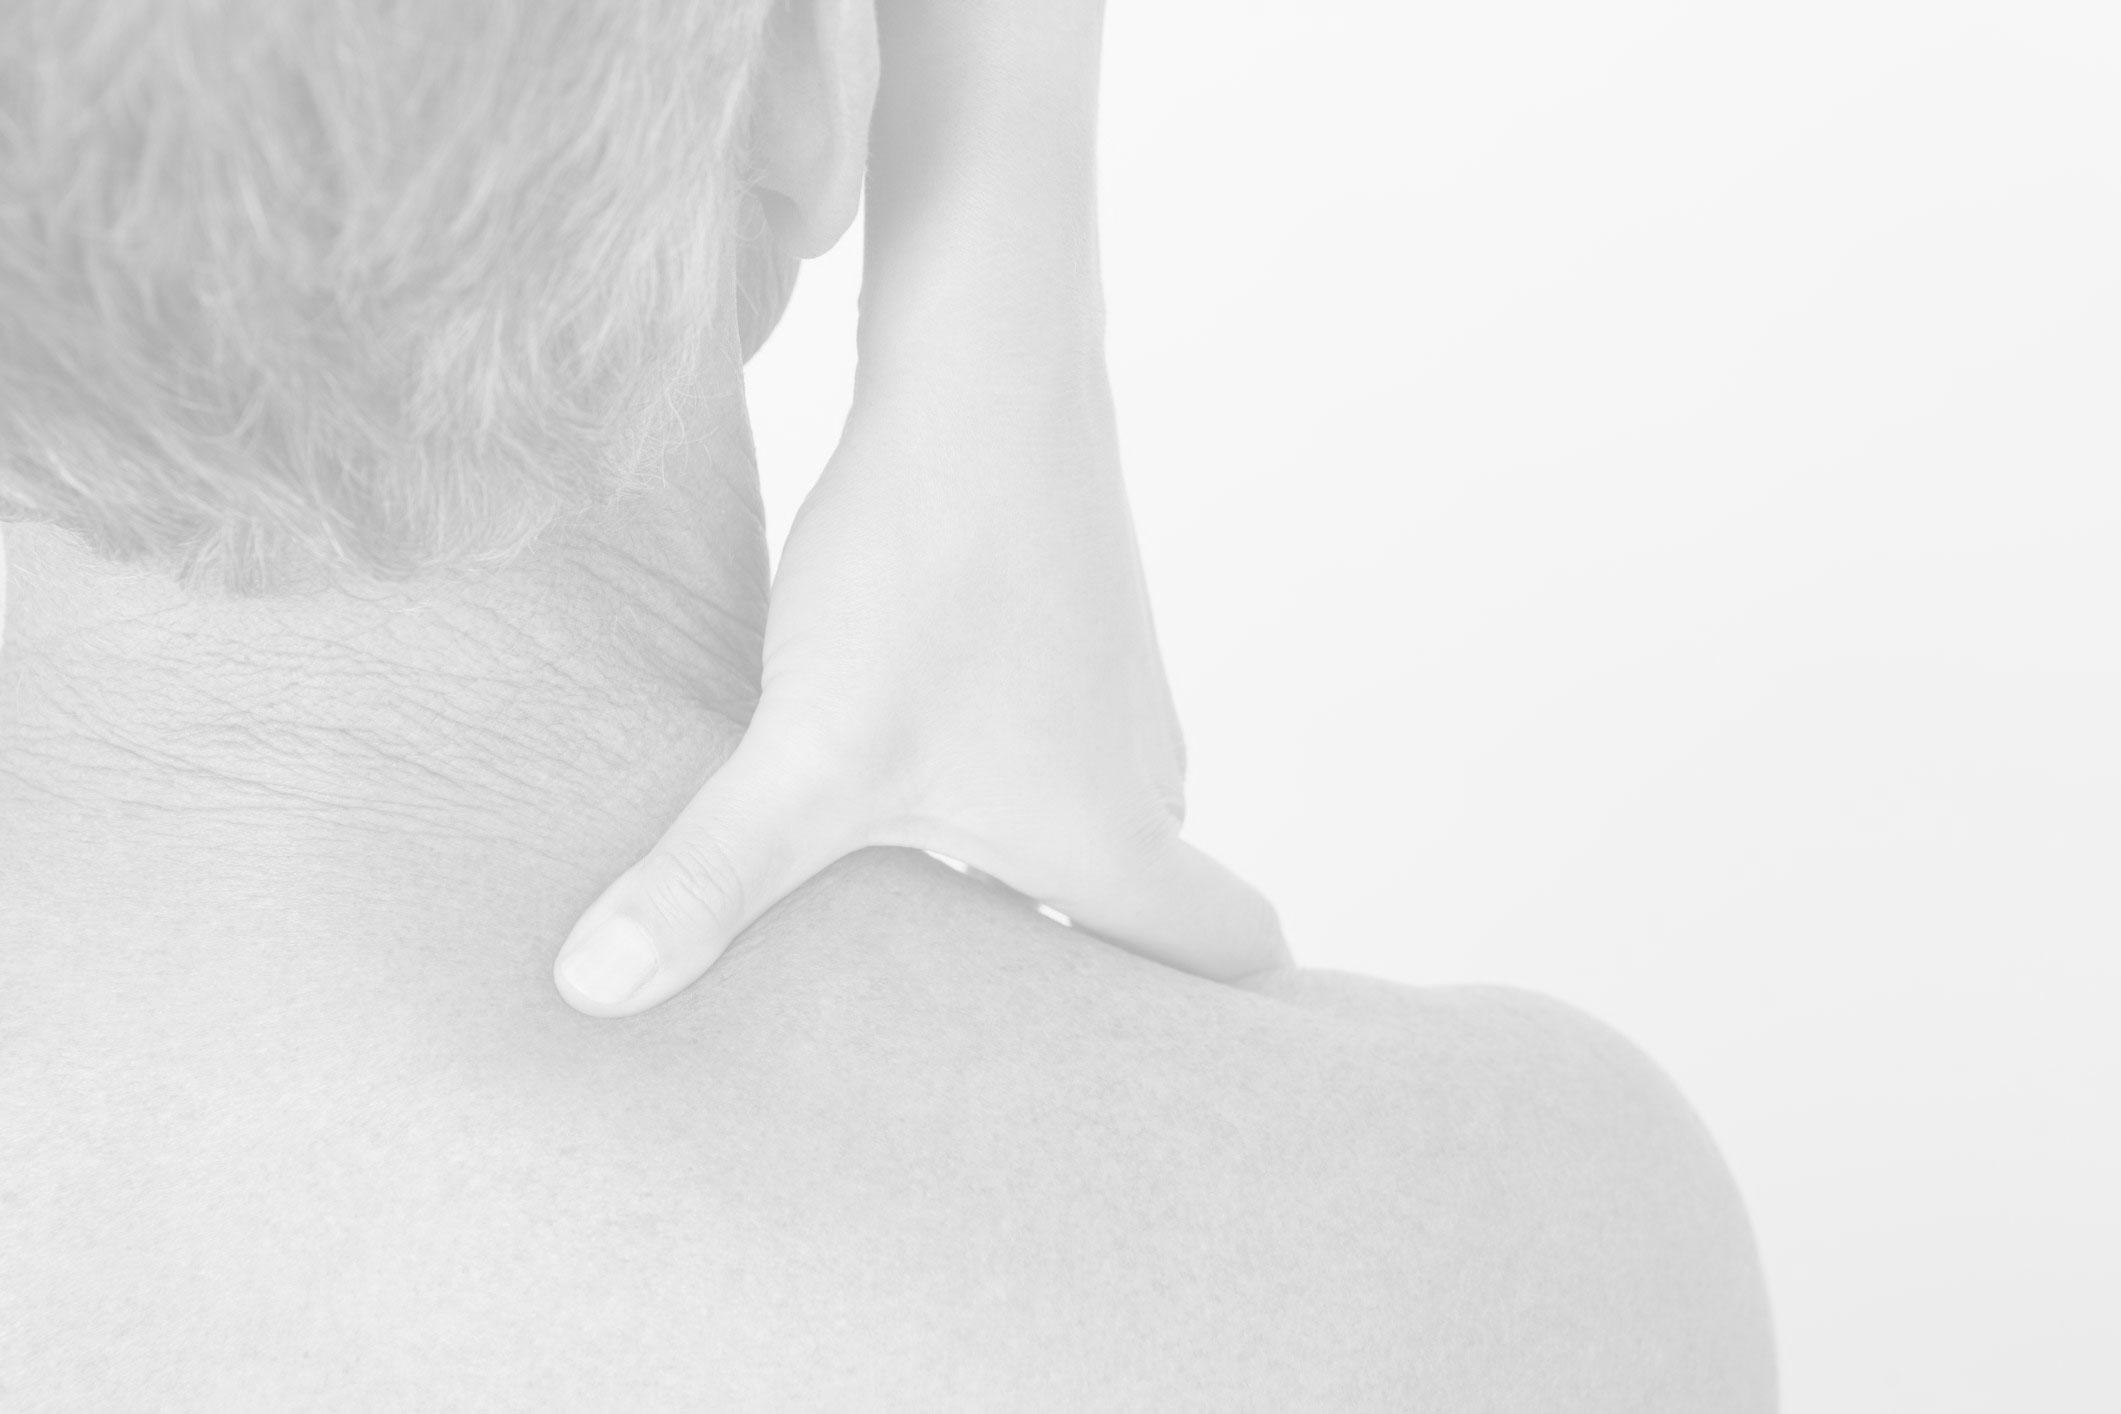 Urgent Care Chiropractic Centers